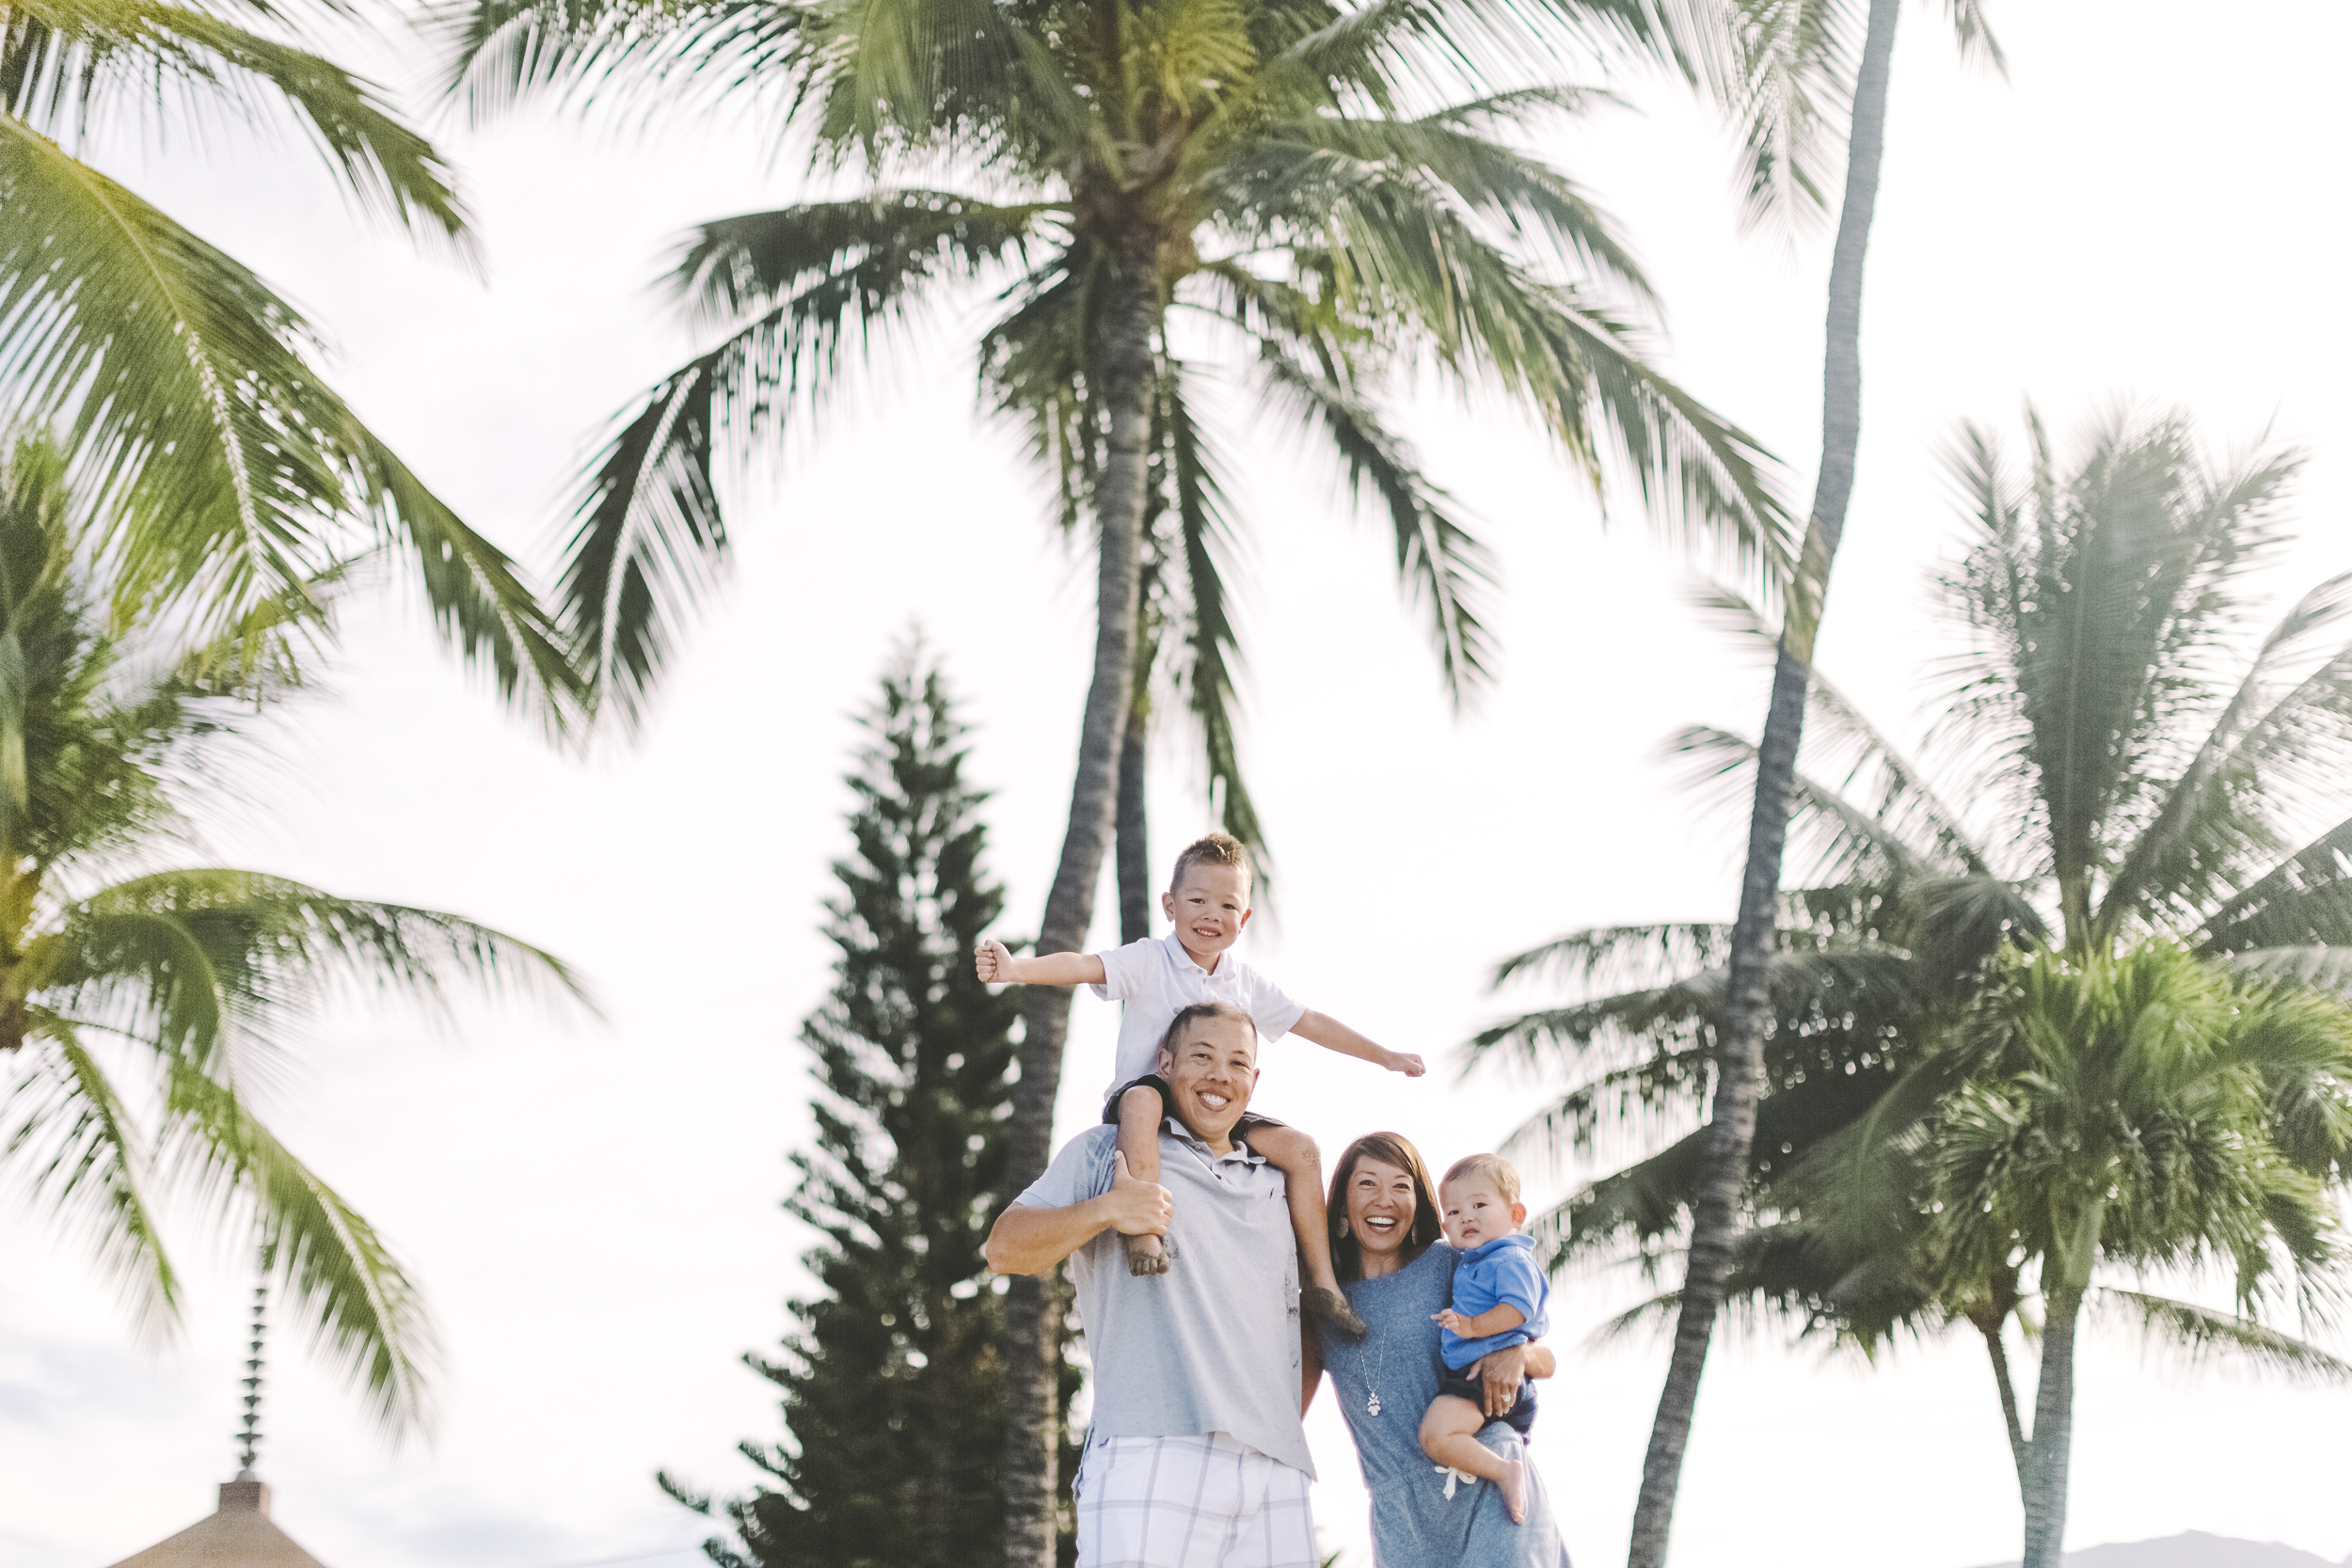 AngieDiaz|beachfamilysession080copy.jpg